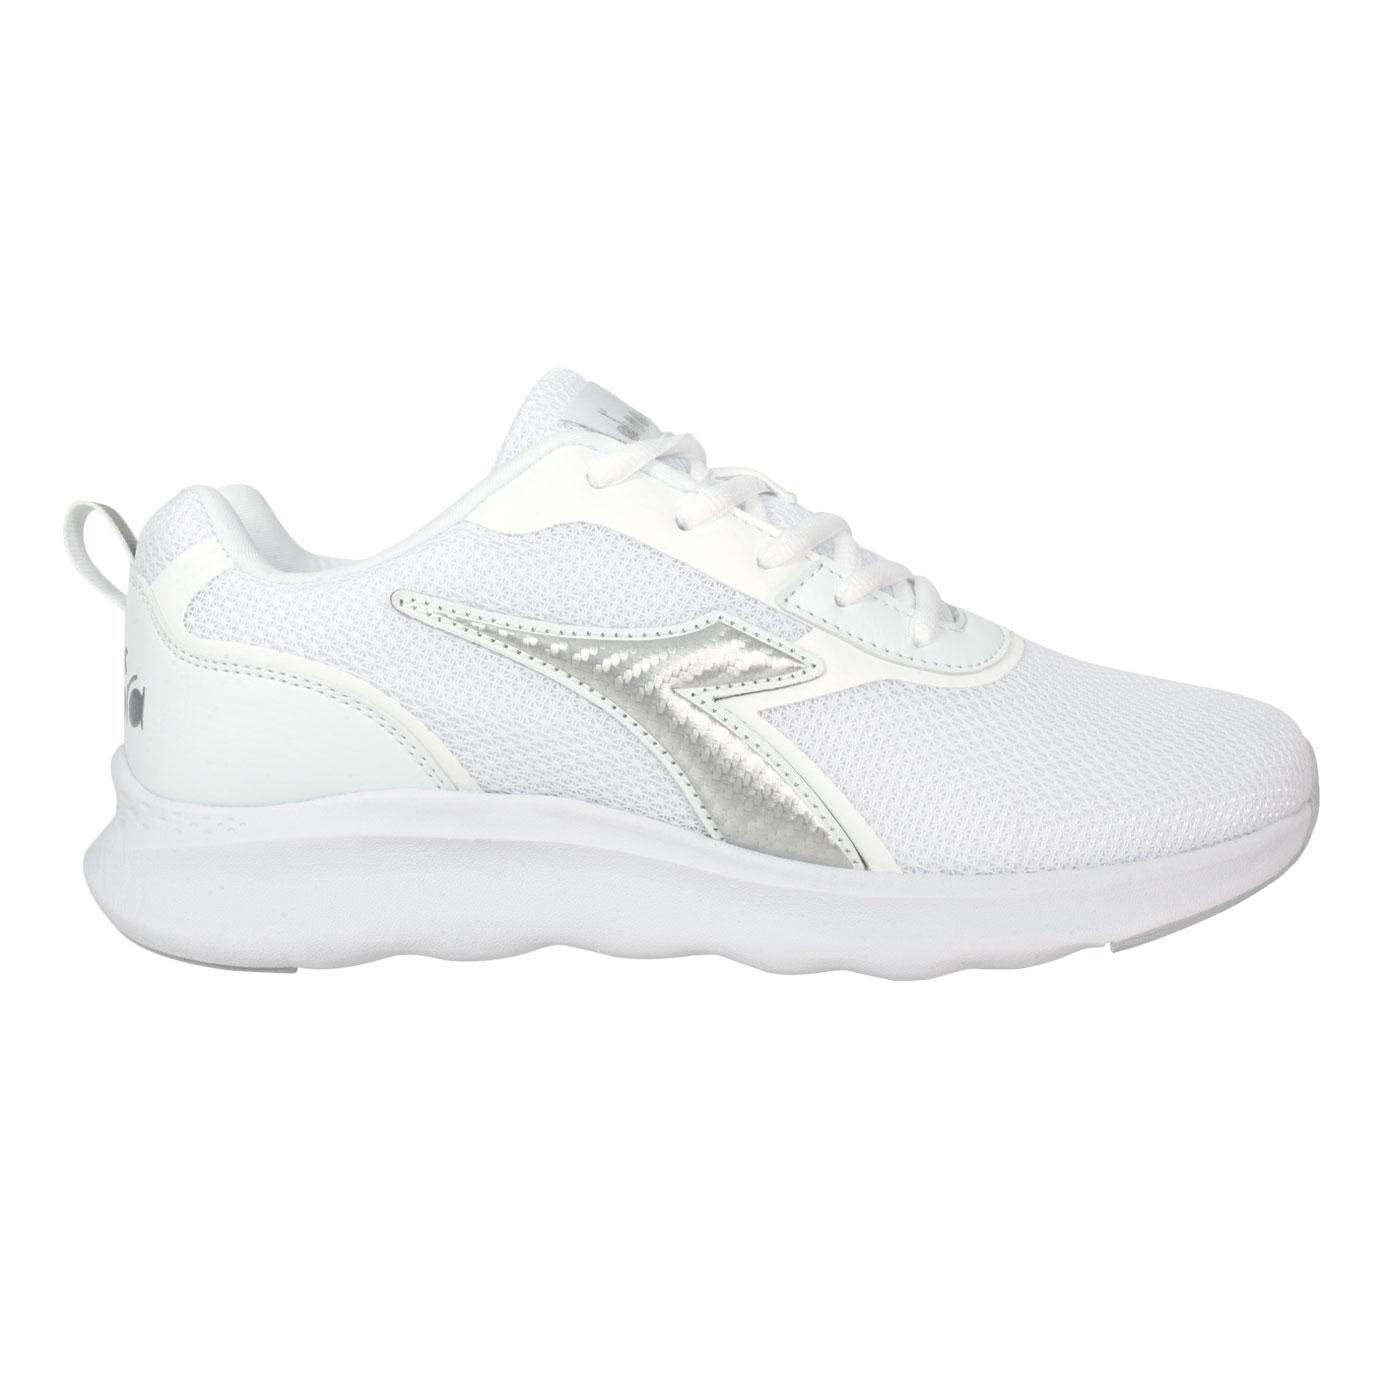 DIADORA 男段運動鞋 DA71186 - 白銀